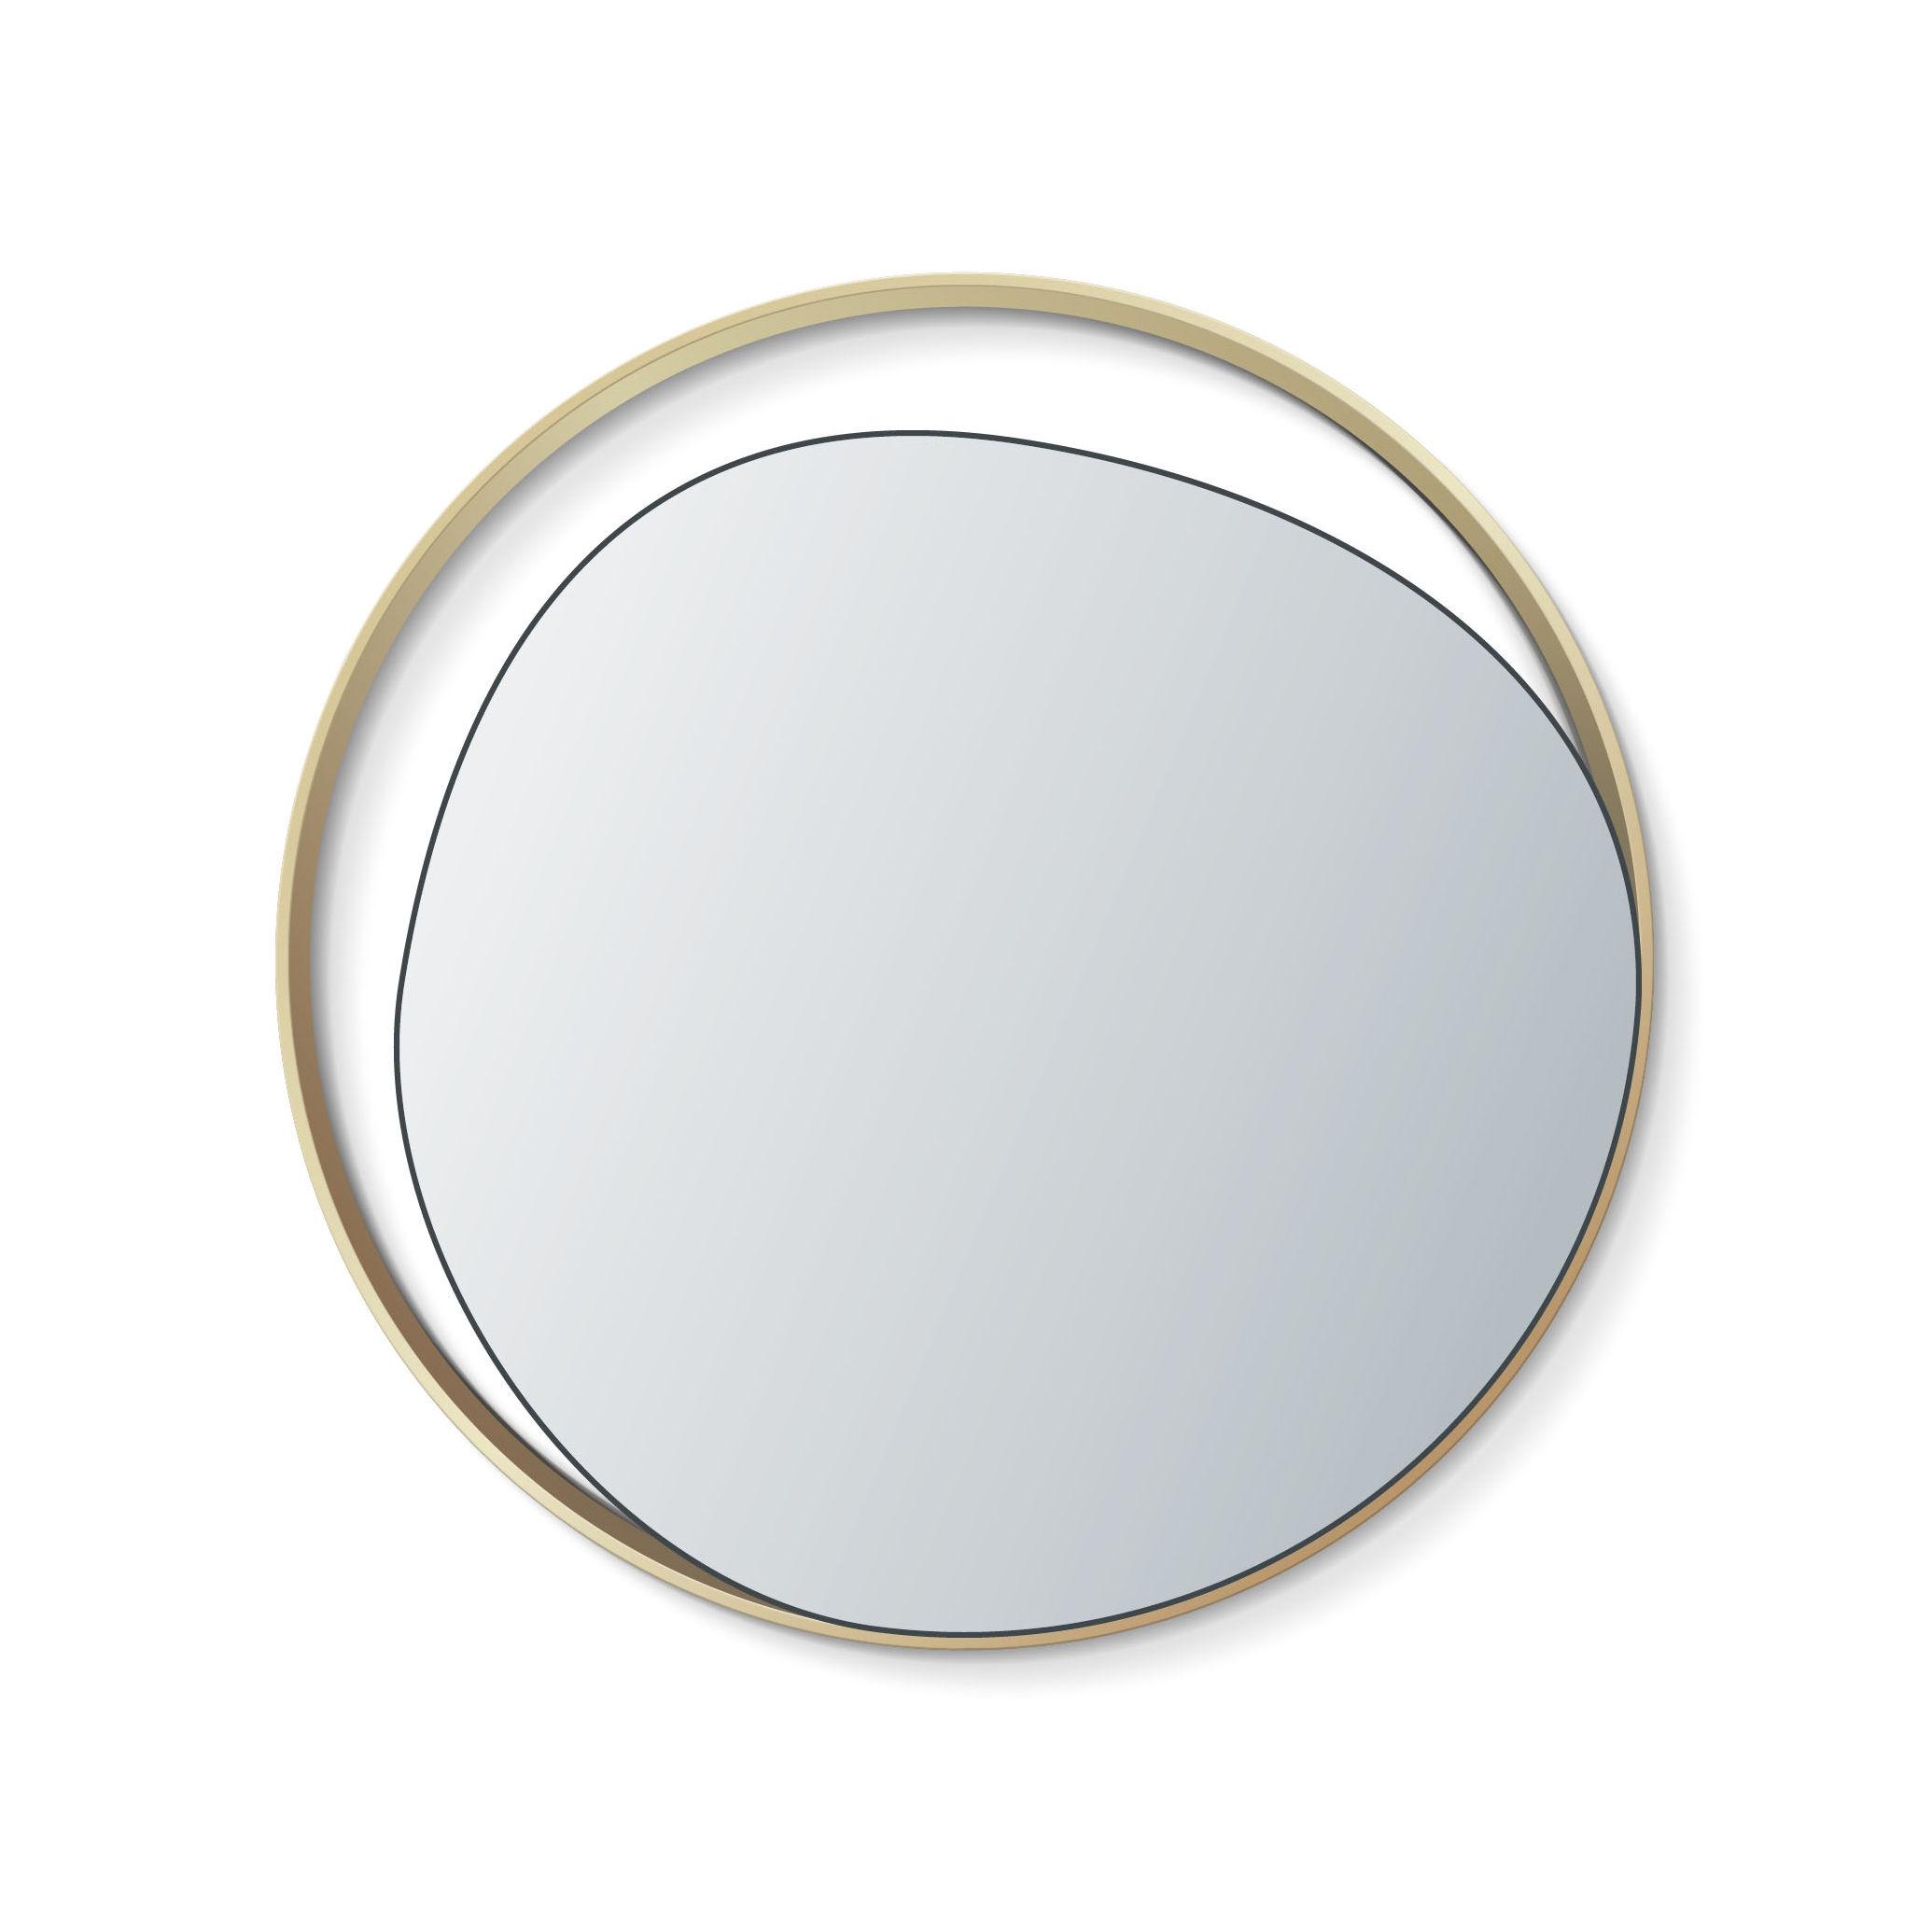 Decoration - Mirrors - Ellipse Wall mirror - / Ø 50 cm by RED Edition - Silver mirror / Brass - Brass, Glass, Wood